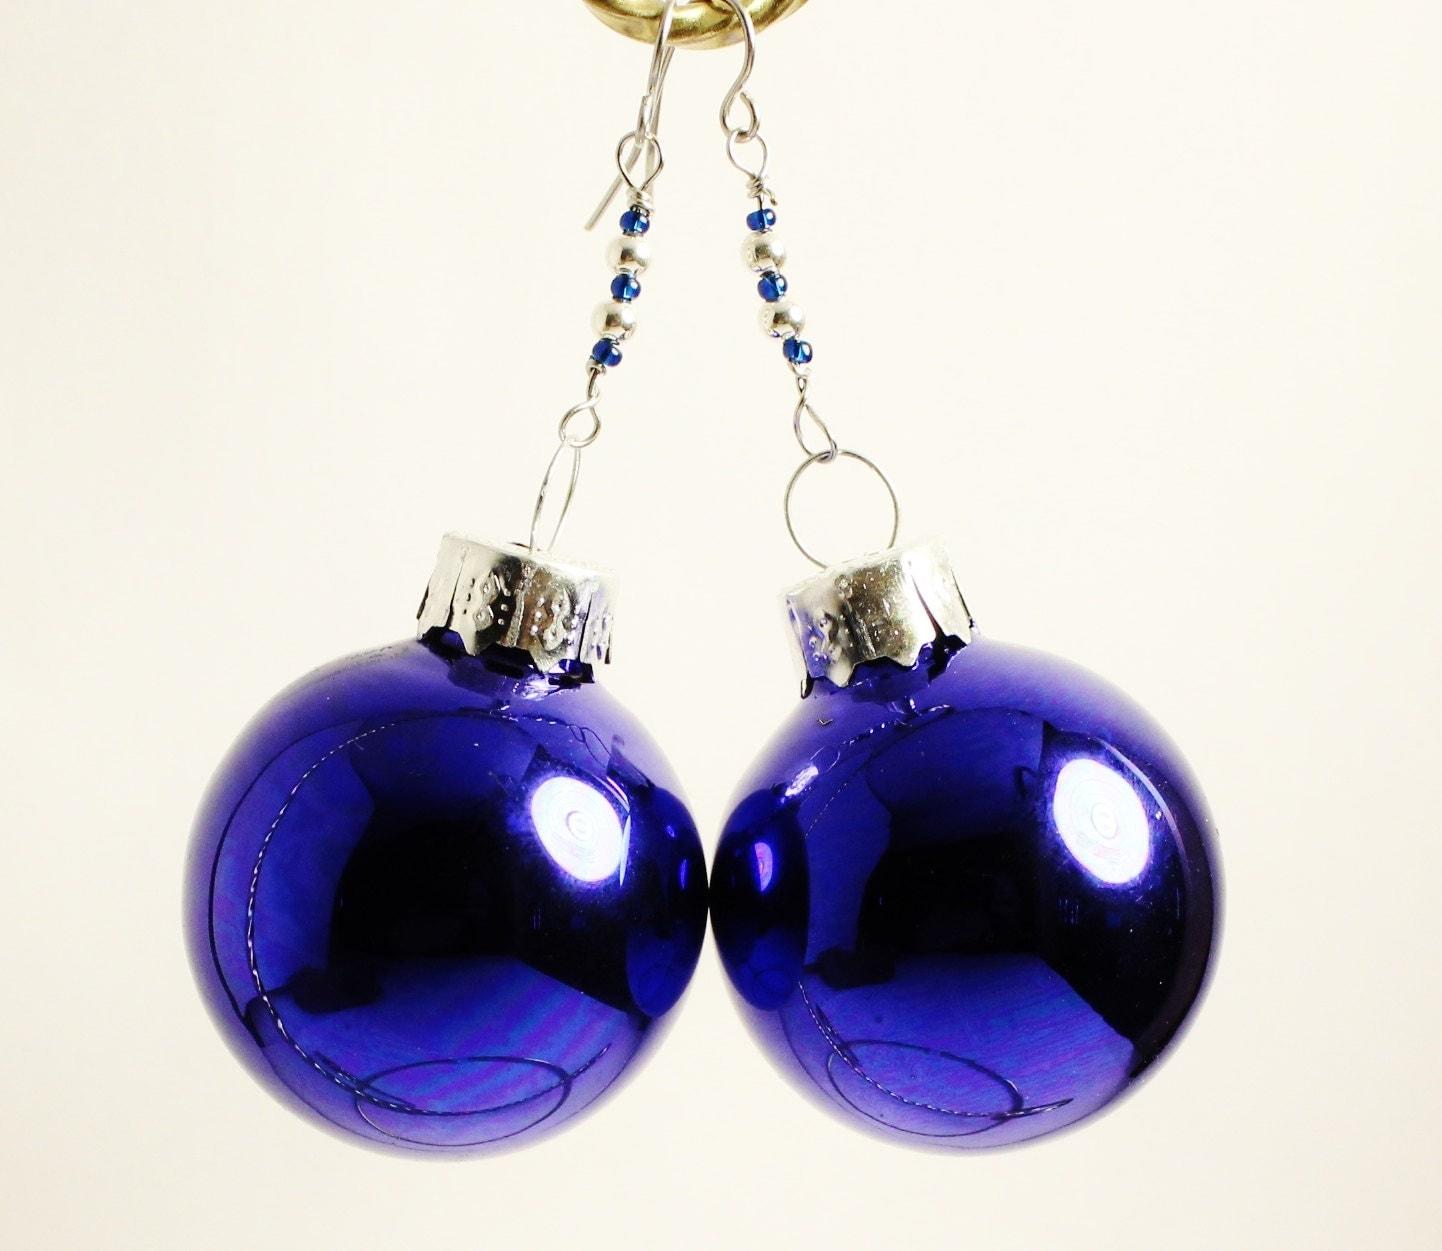 Christmas ornament earrings blue glass ball round